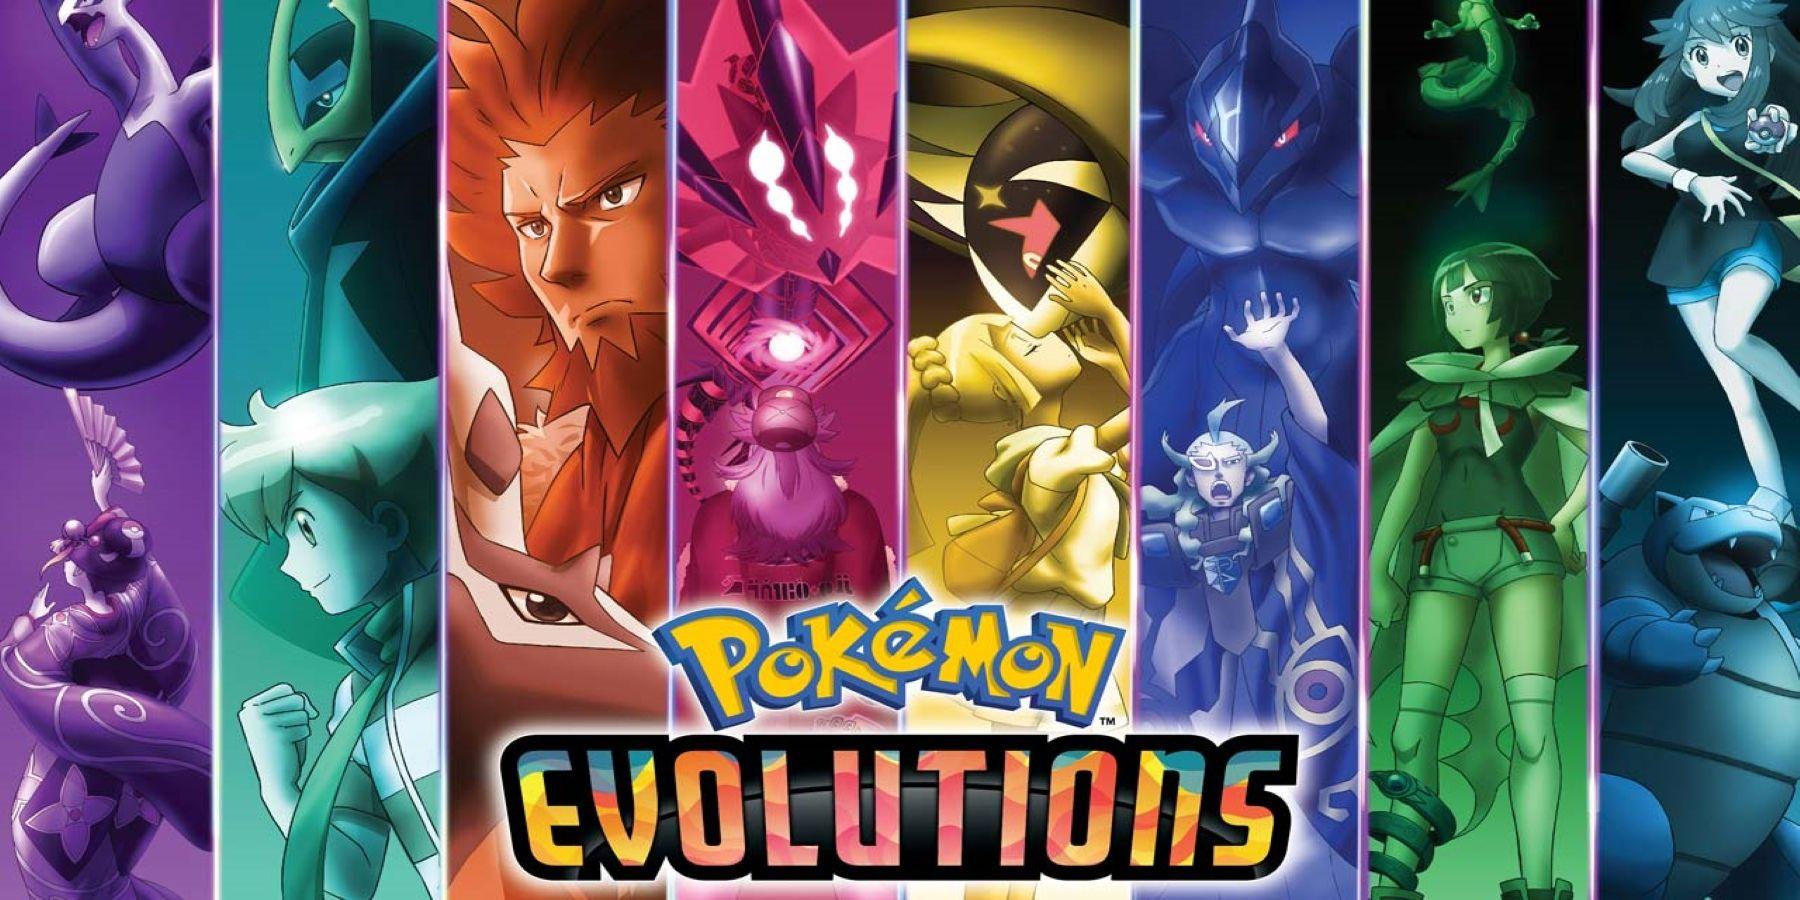 Cover image of Pokémon Evolutions (Dub)